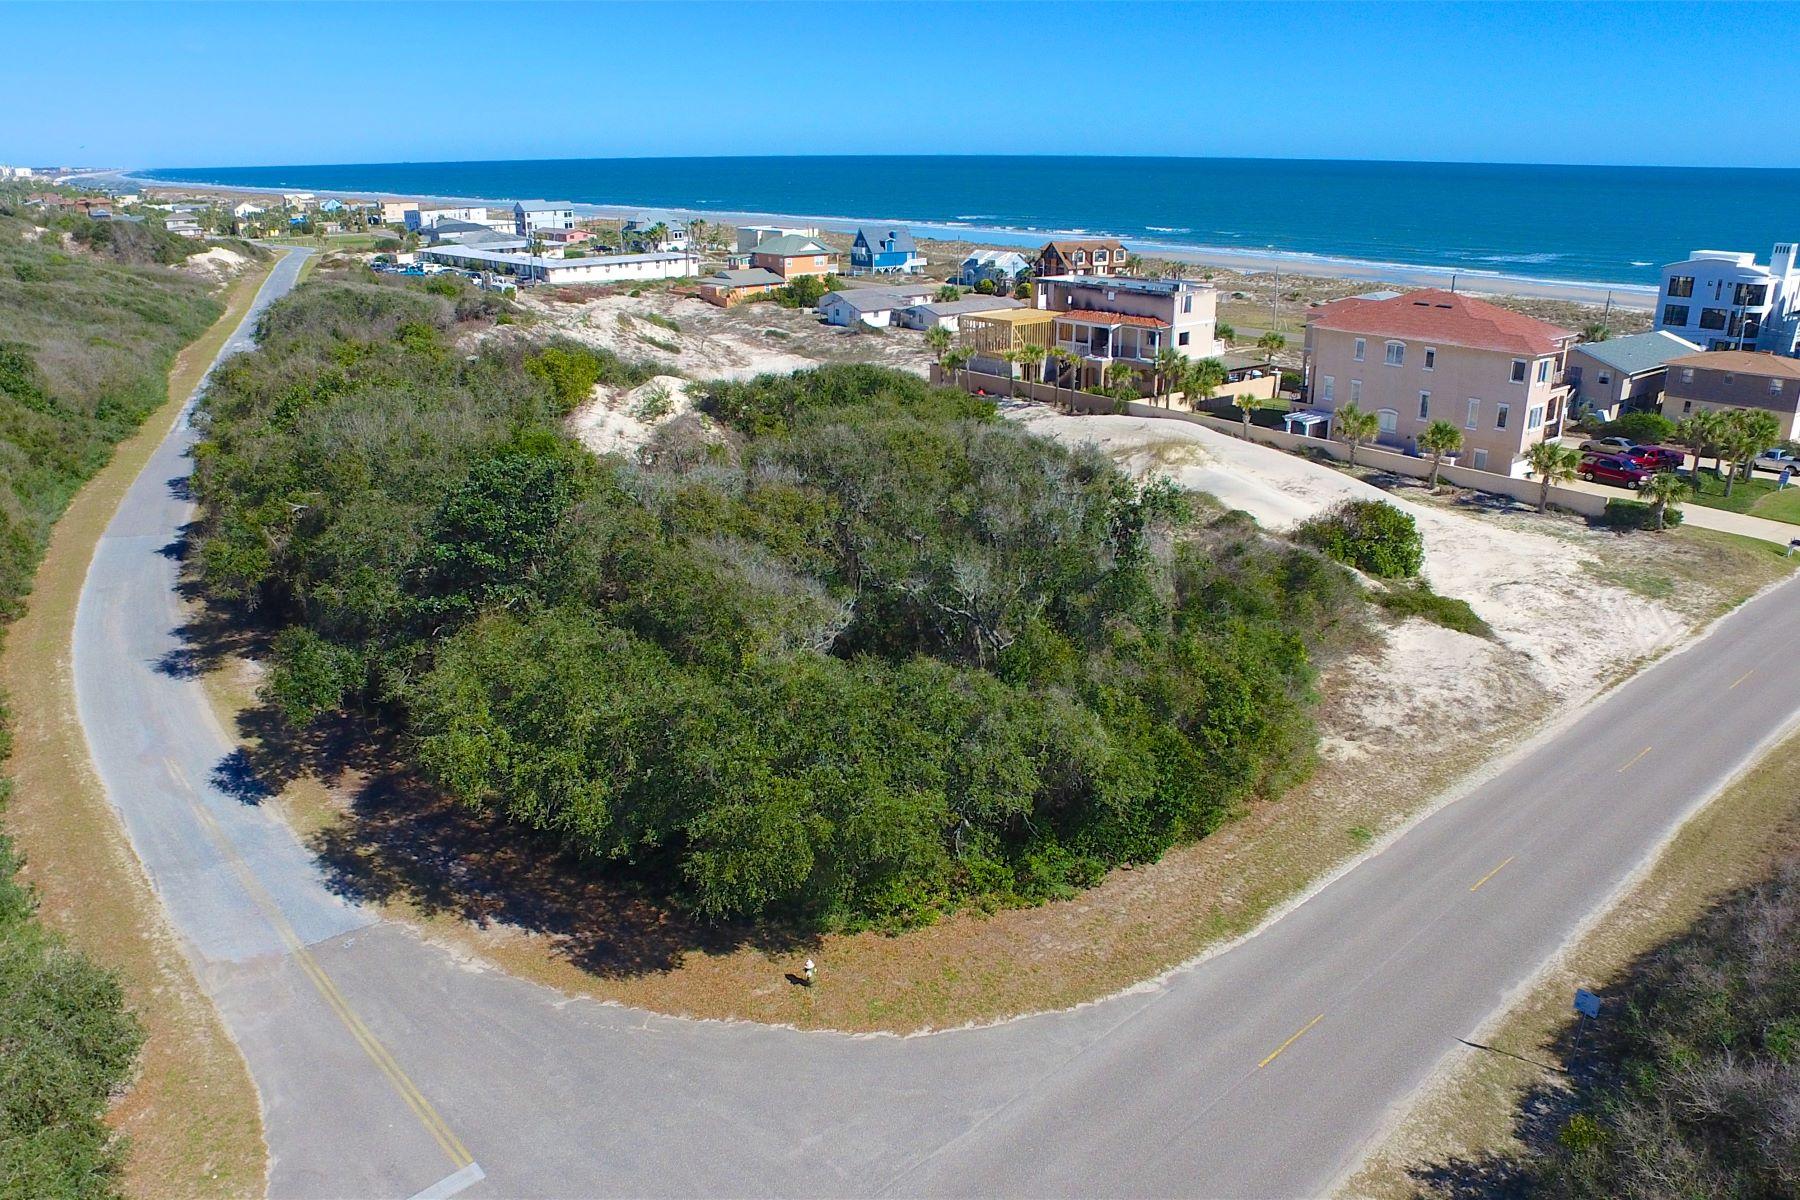 Land for Sale at Lot 6 Ocean Blvd Lot 6 Ocean Blvd Amelia Island, Florida 32034 United States